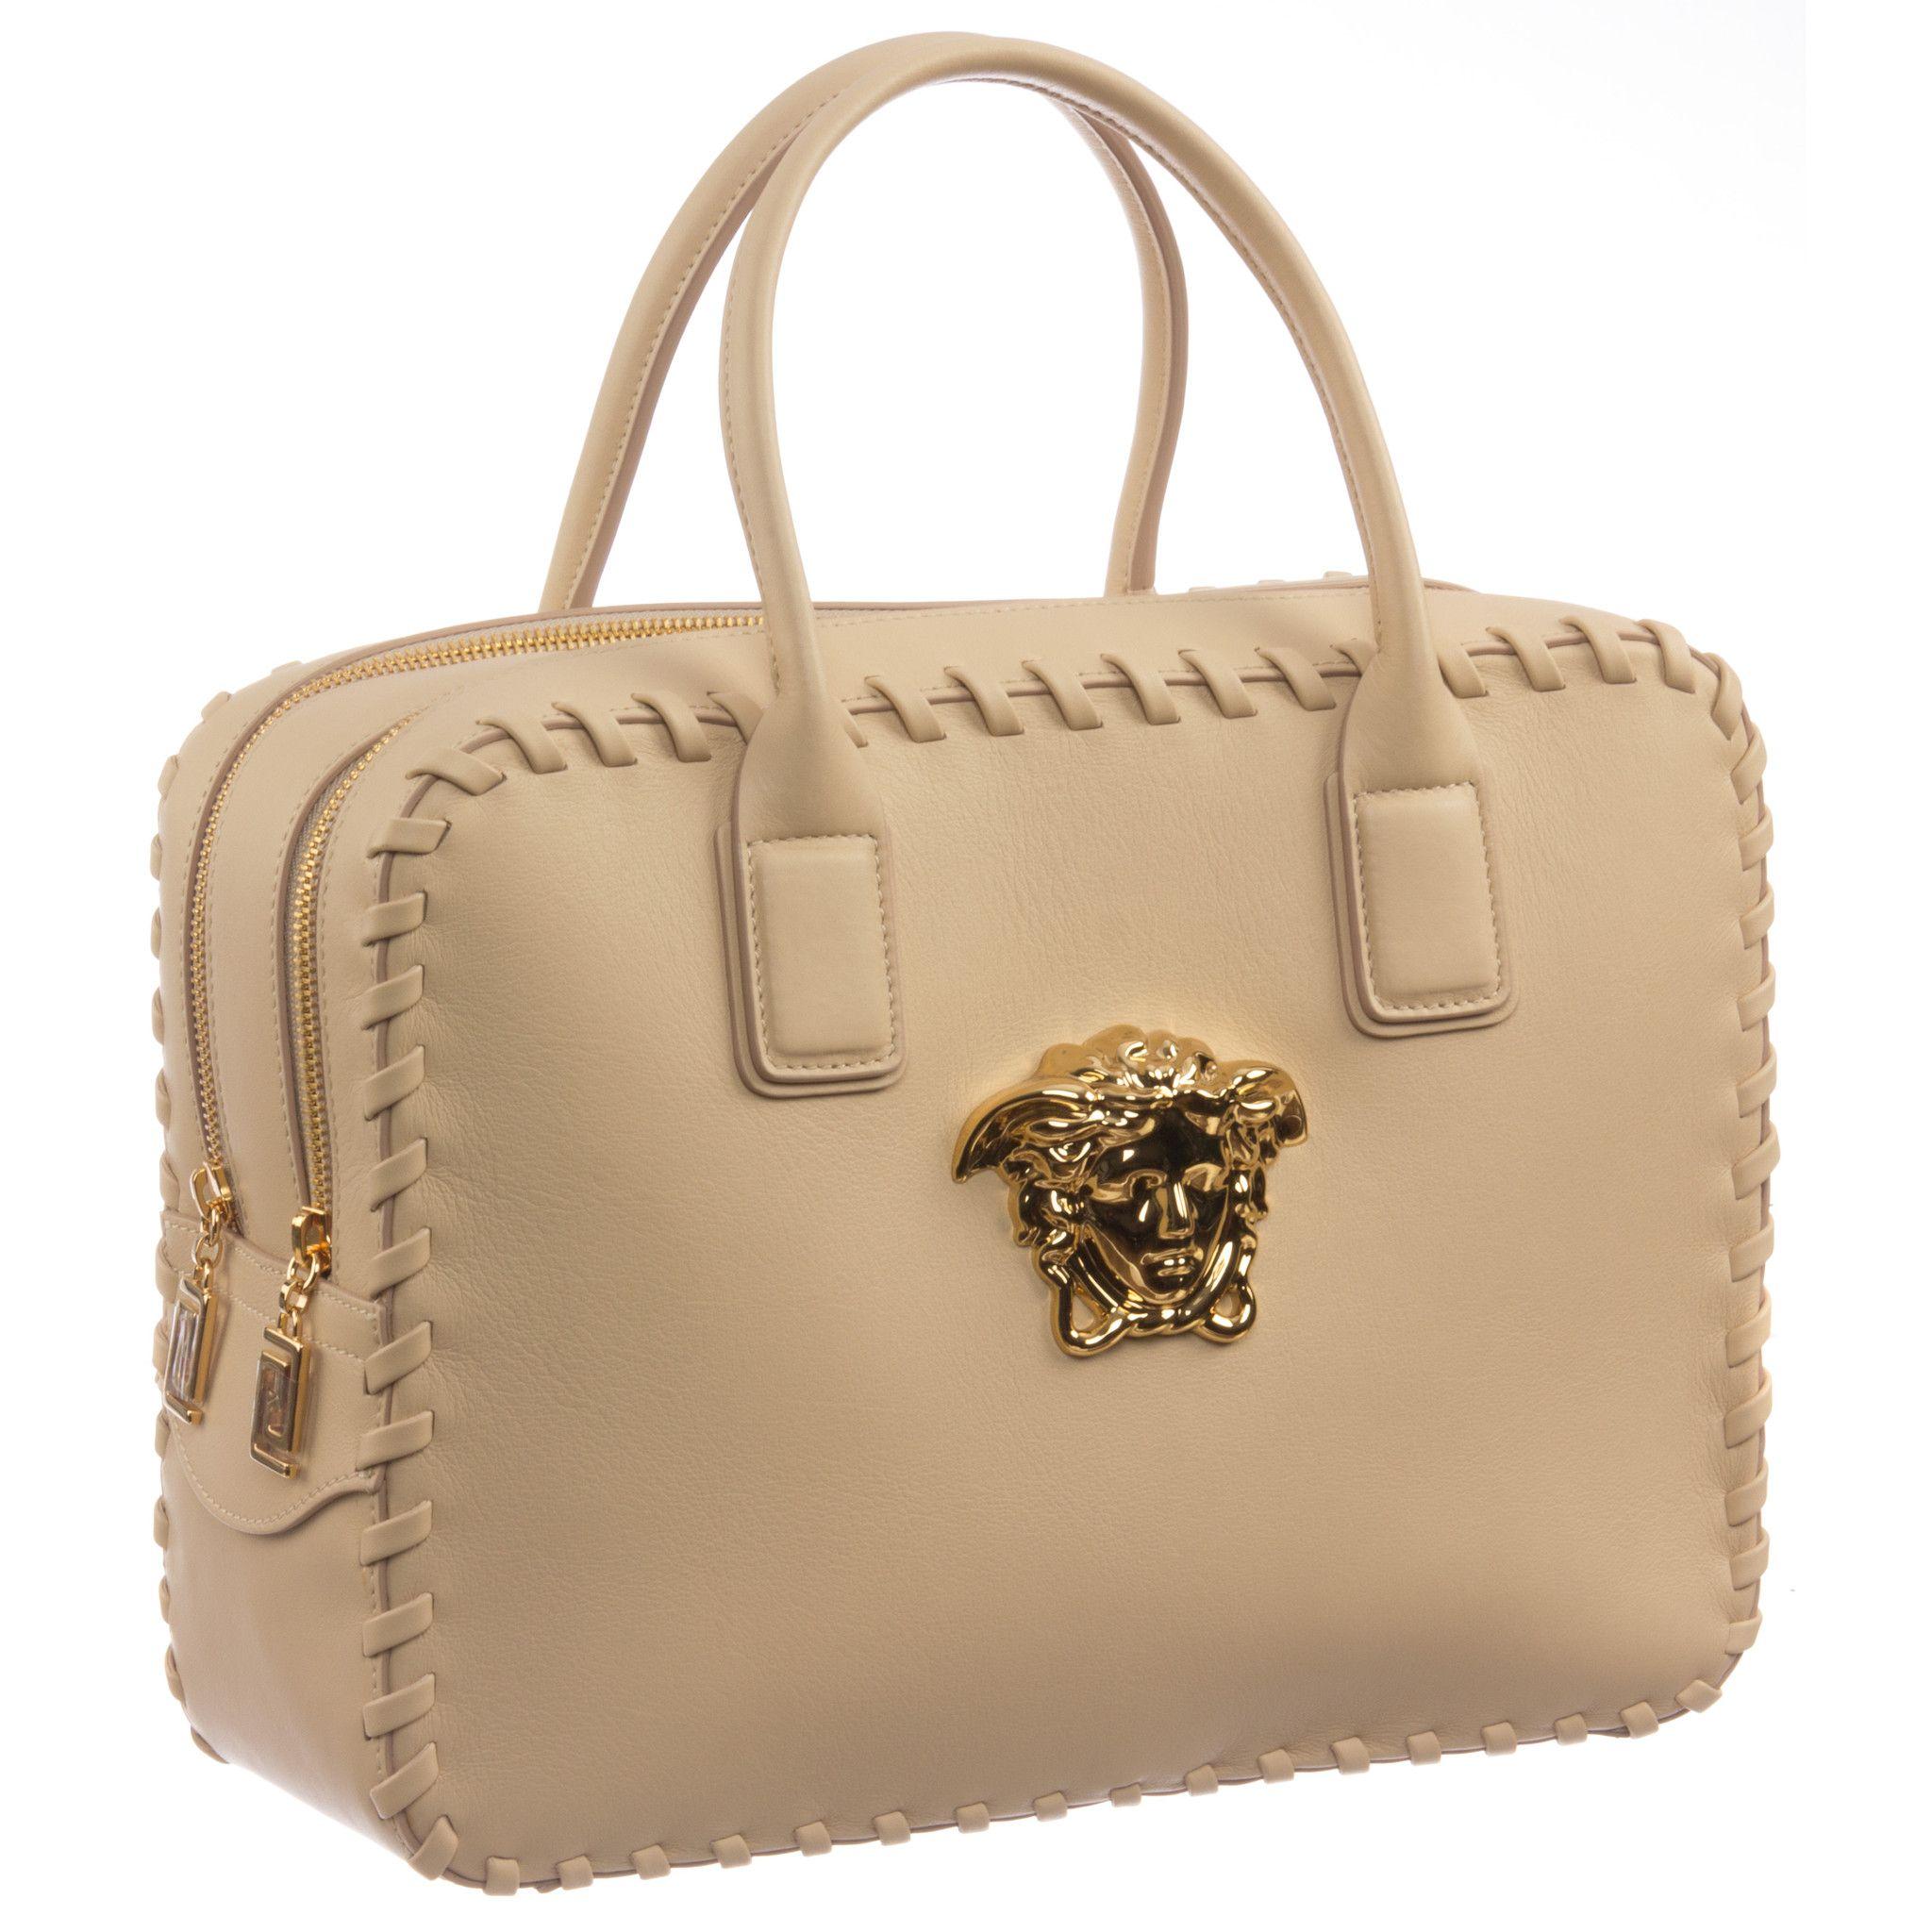 9c1328a2531f Versace Signature Medusa Lock Leather Handbag-K240H Cuero Auténtico